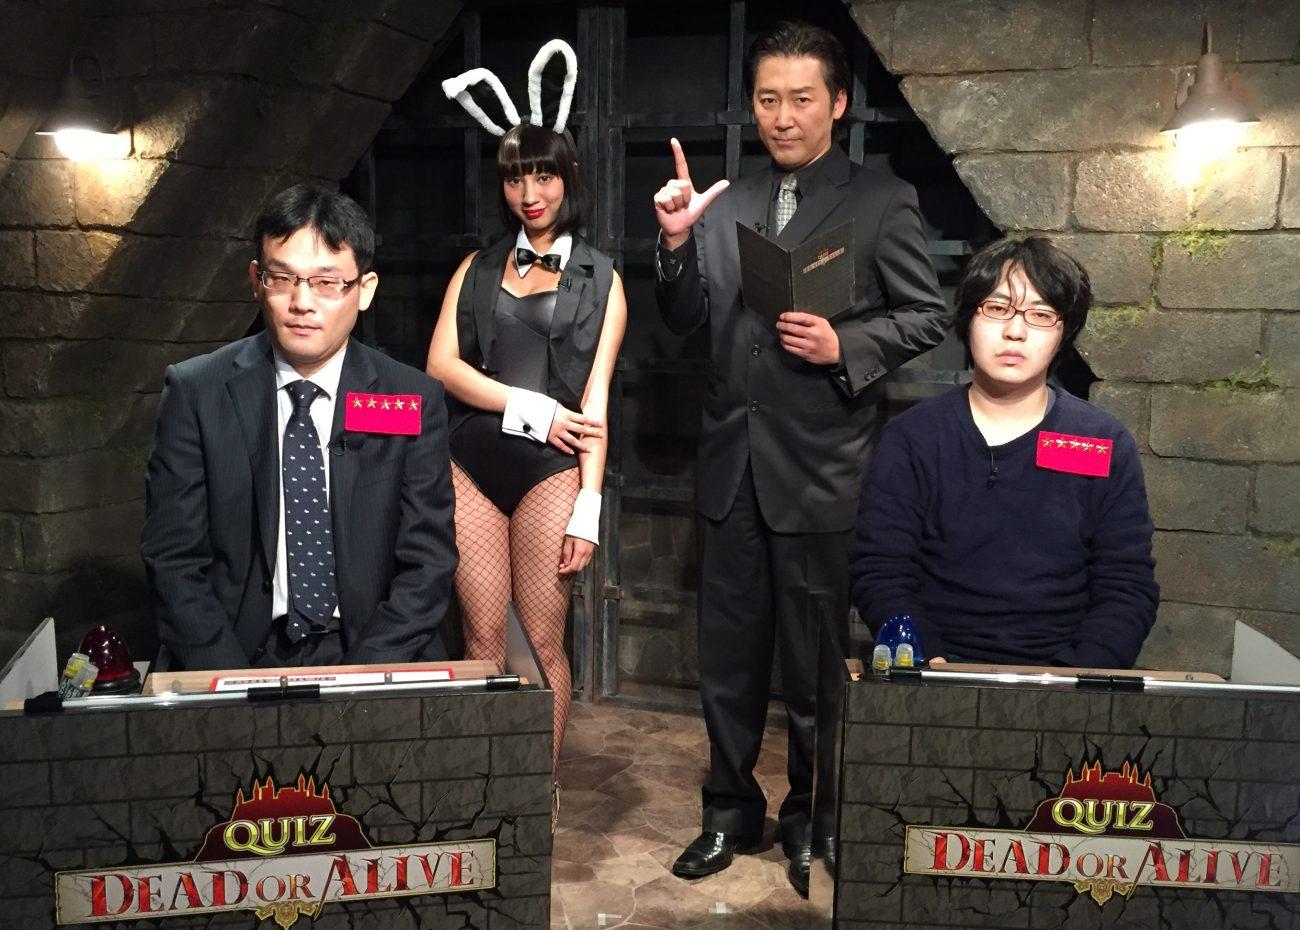 QUIZ JAPAN TVのオリジナルクイズ番組「QUIZ DEAD OR ALIVE」#22は安藤VS武藤の準決勝戦!